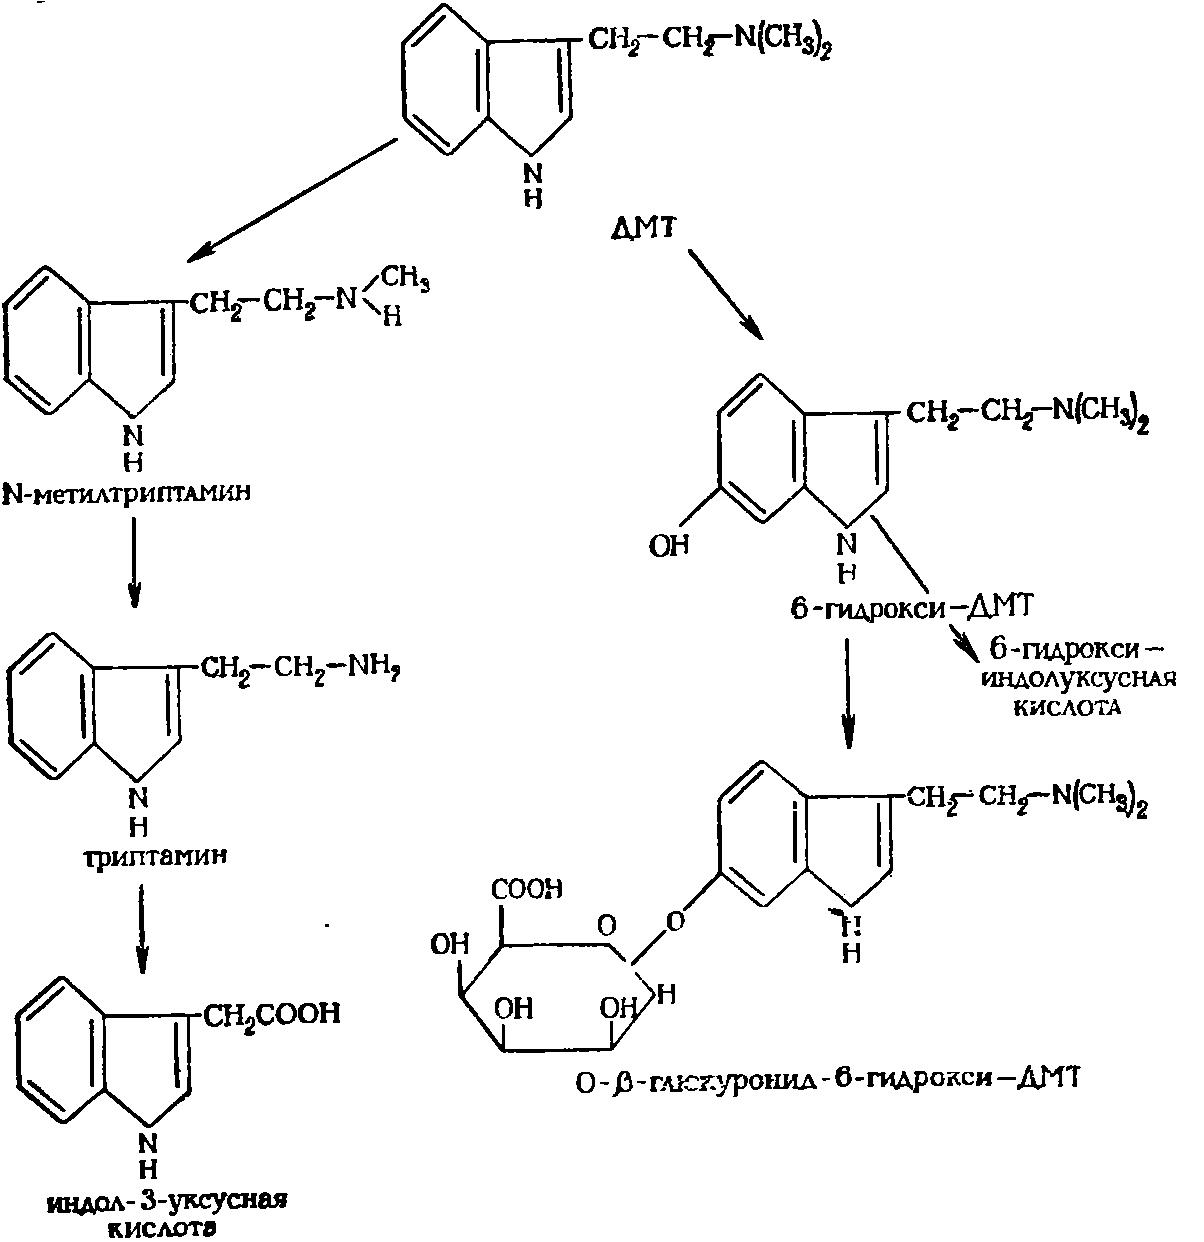 Инструкция по применению препарата «пророксан»